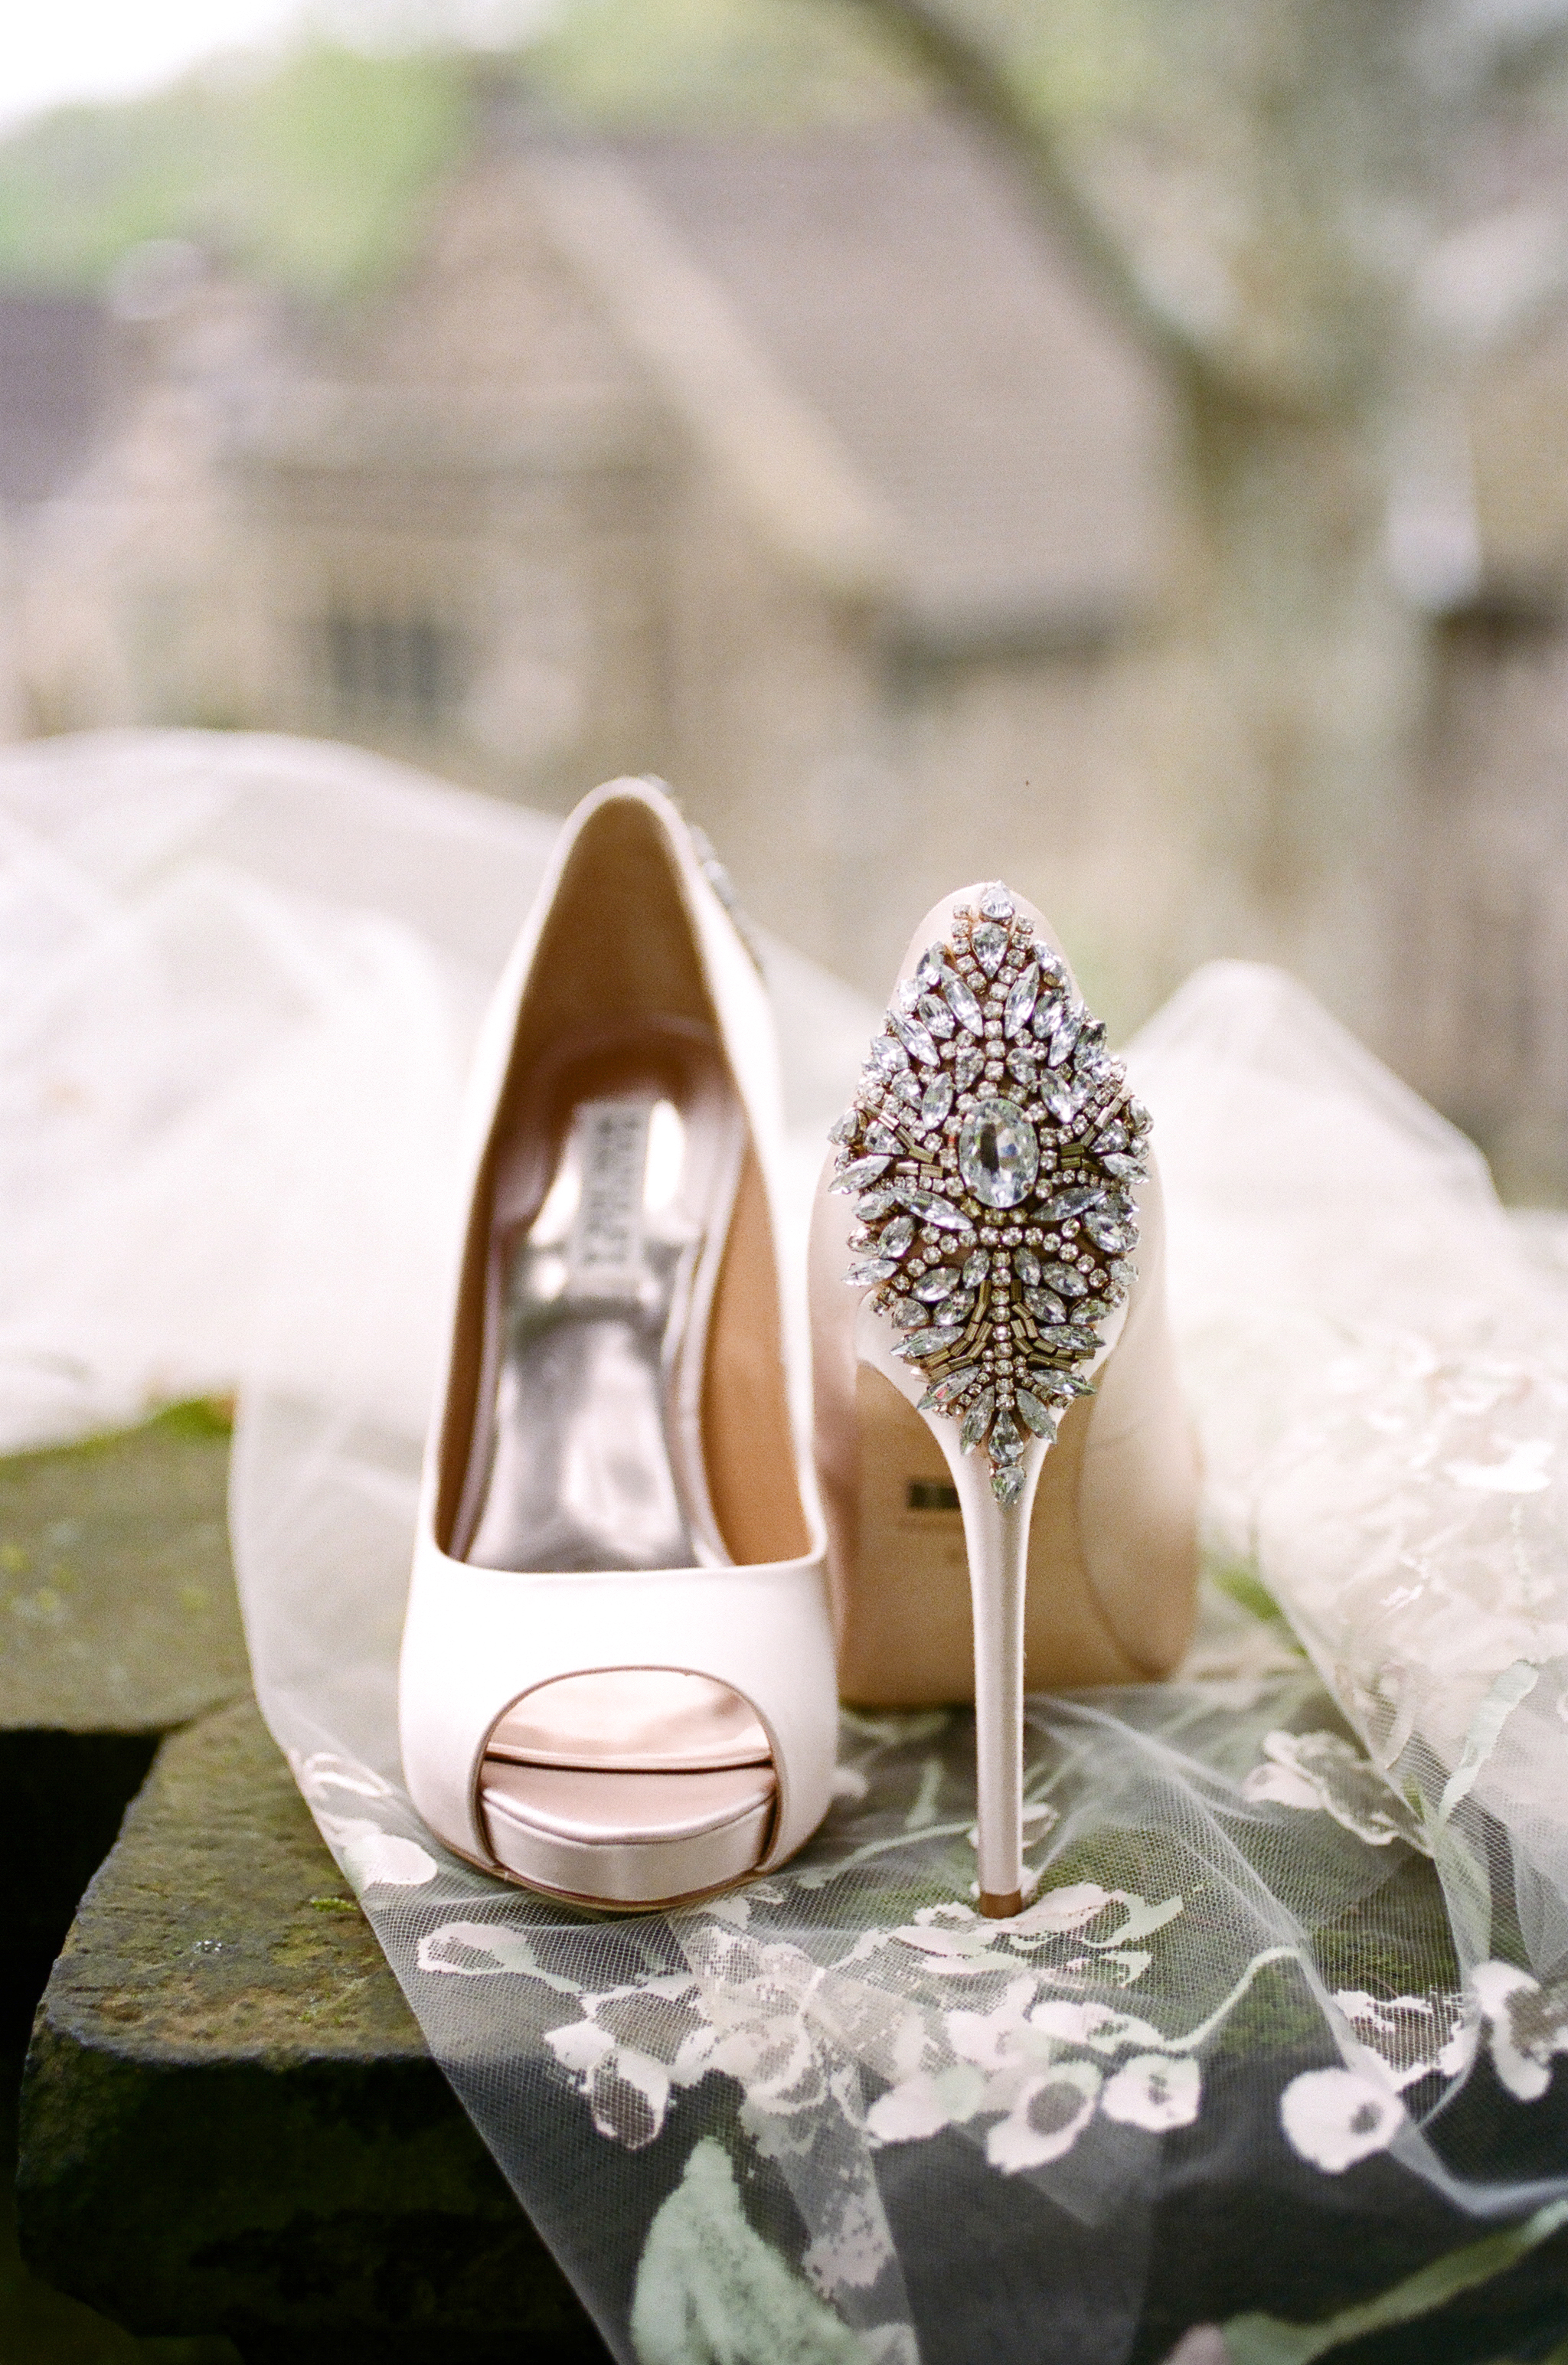 HNP-Modern-Fairytale-Spring-Wedding-Styled-Shoot_013